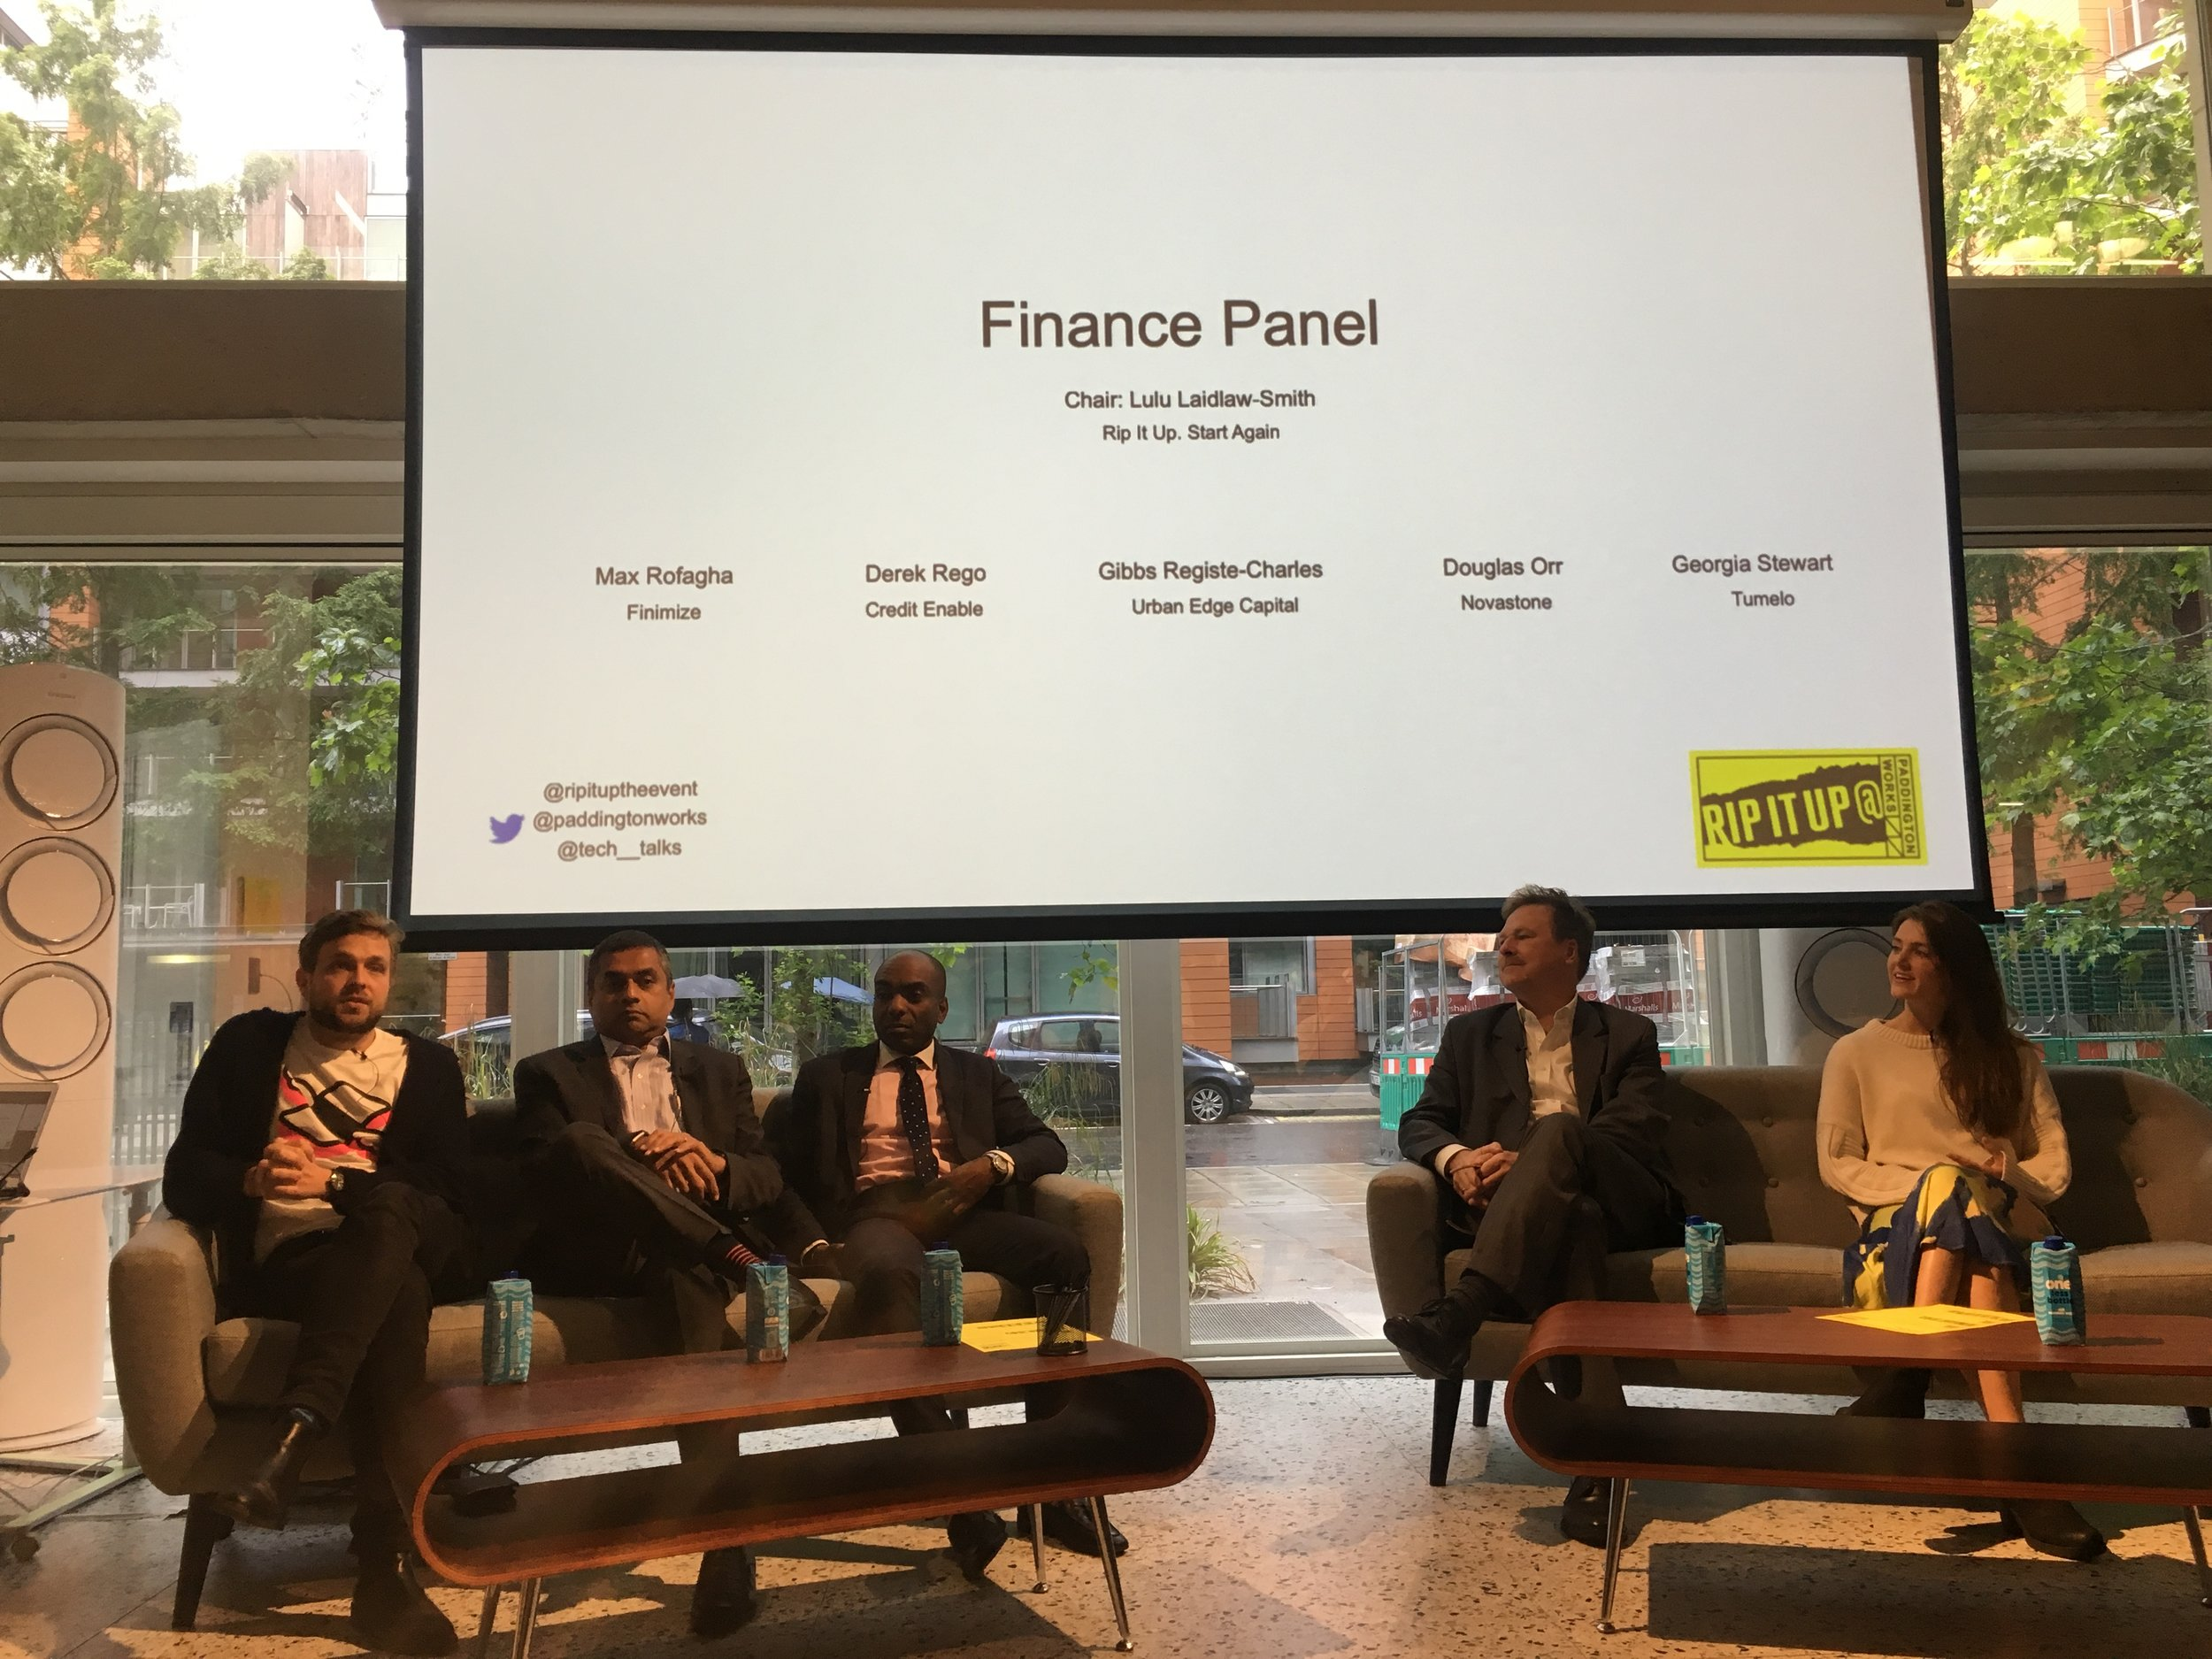 Finance Panel Photo.JPG